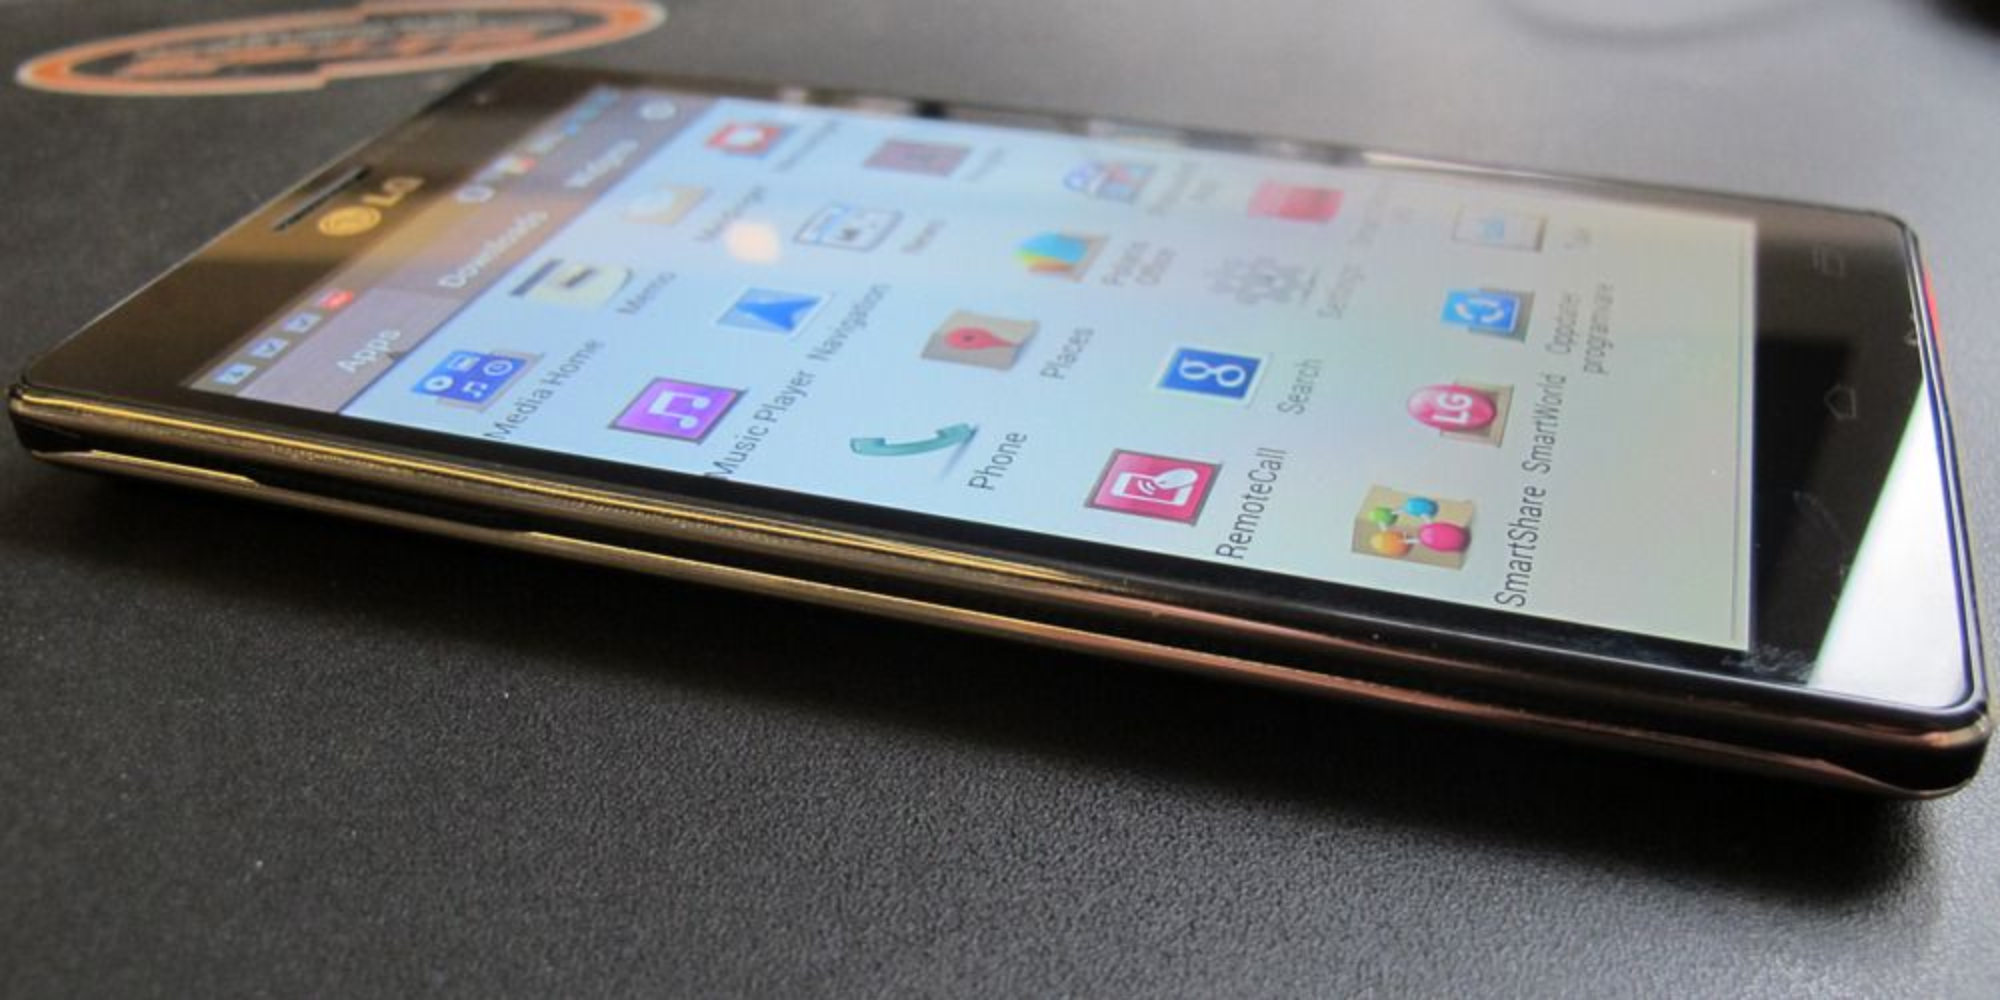 Lyntest: LG Optimus 4X HD